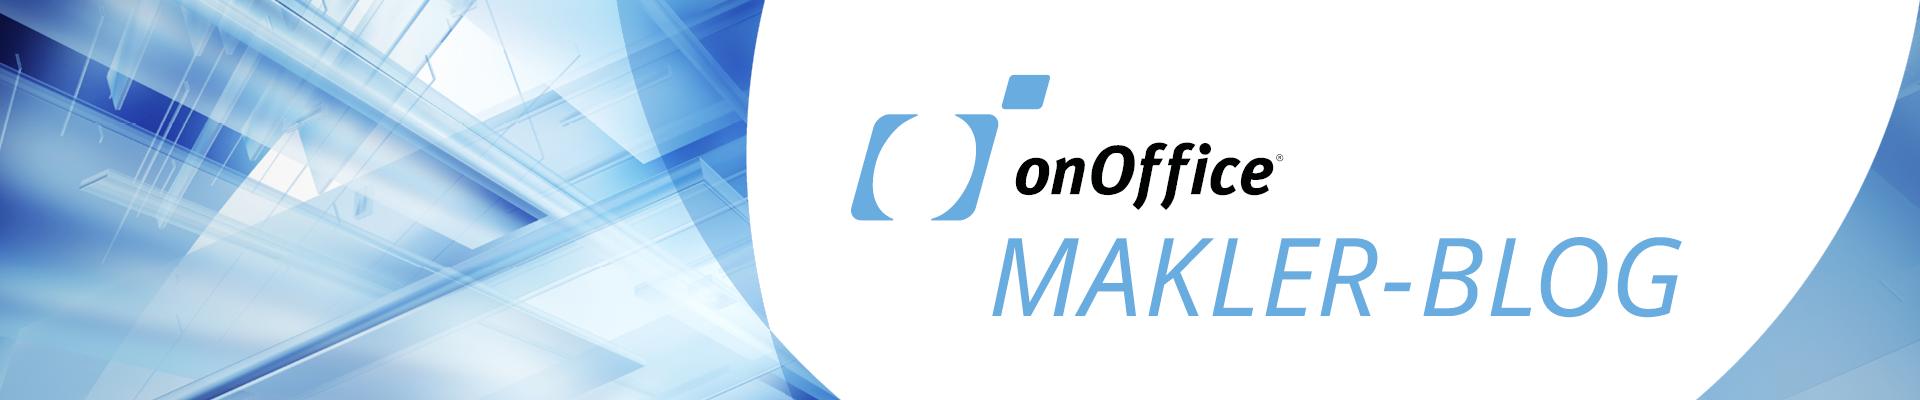 onOffice Maklerblog